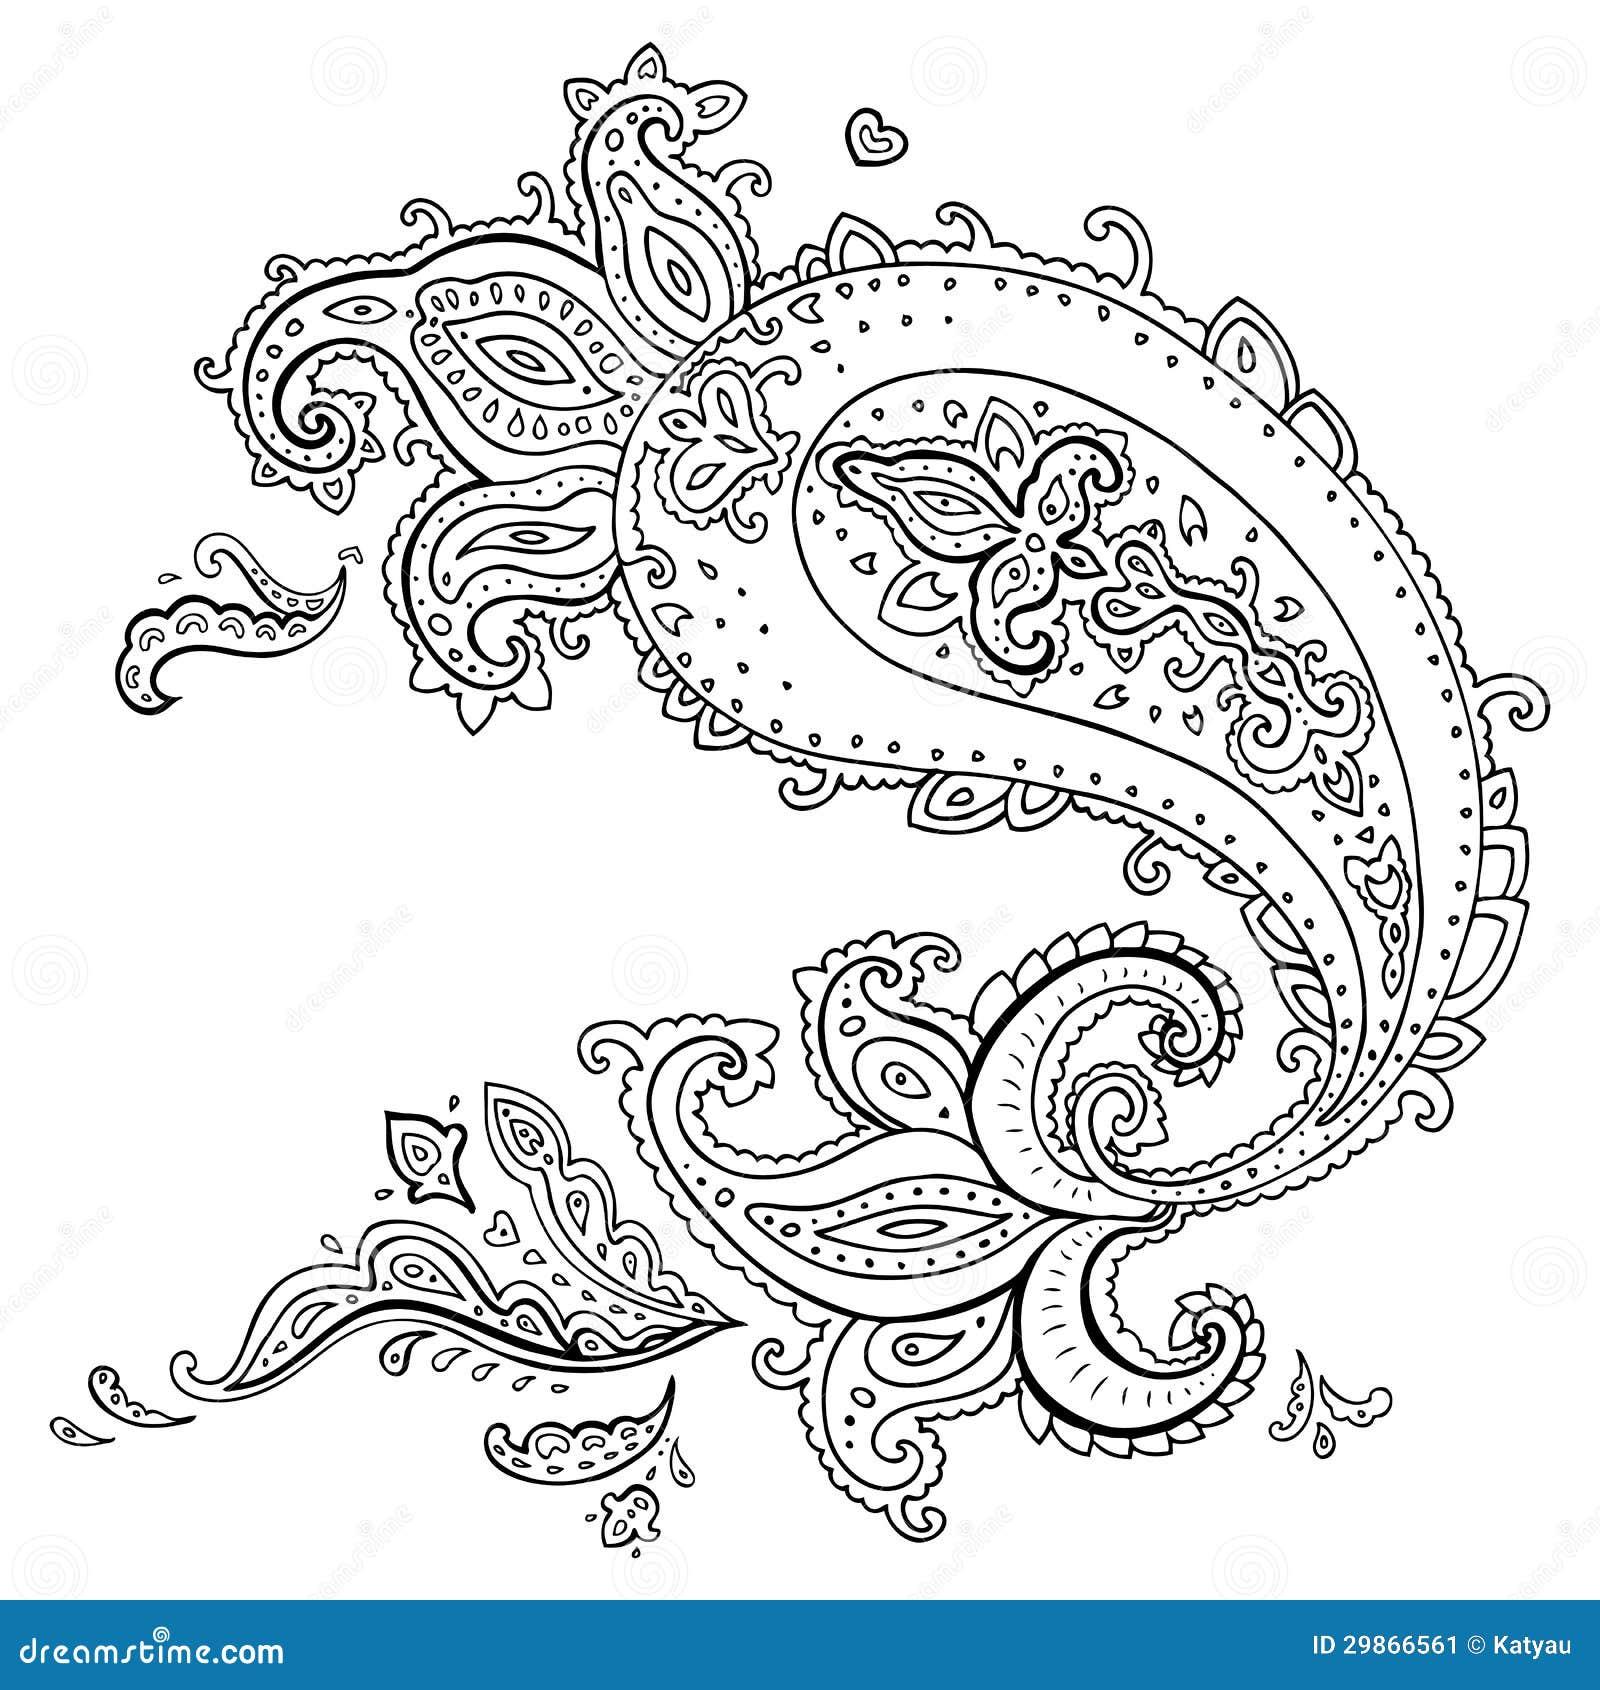 Hand Drawn Paisley Ornament. Stock Image - Image: 29866561